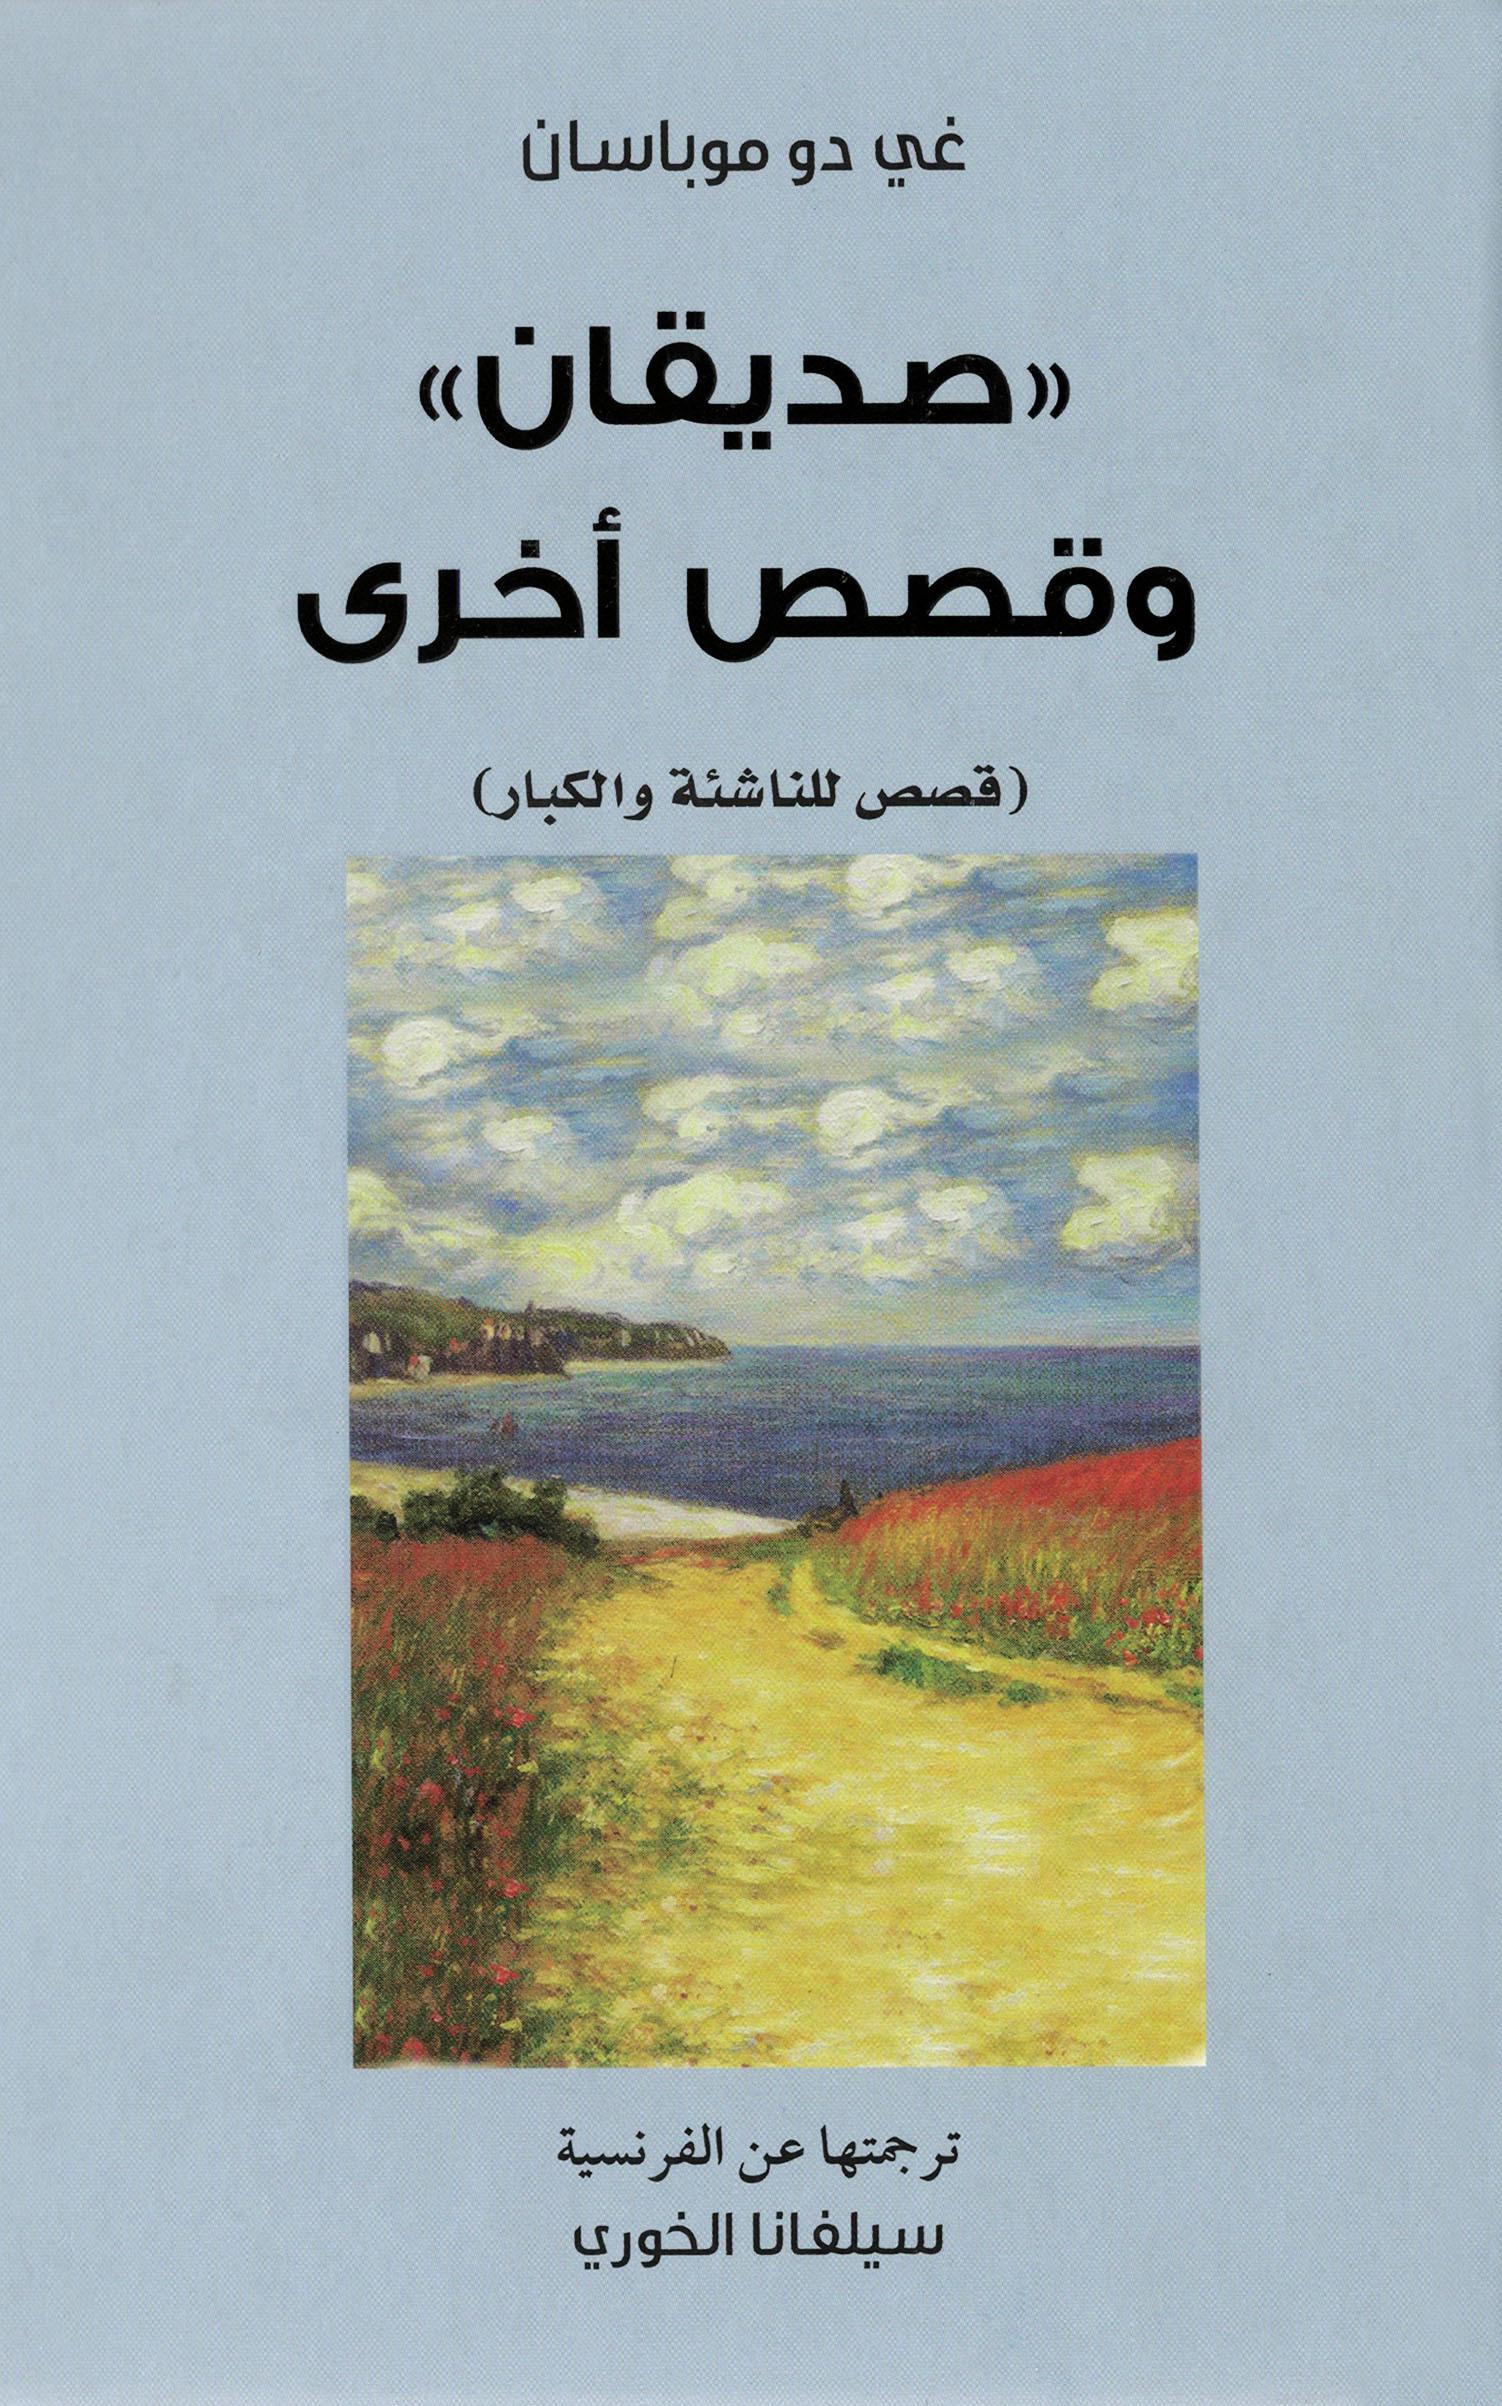 صديقان وقصص اخرى  by  غى دو موبسان